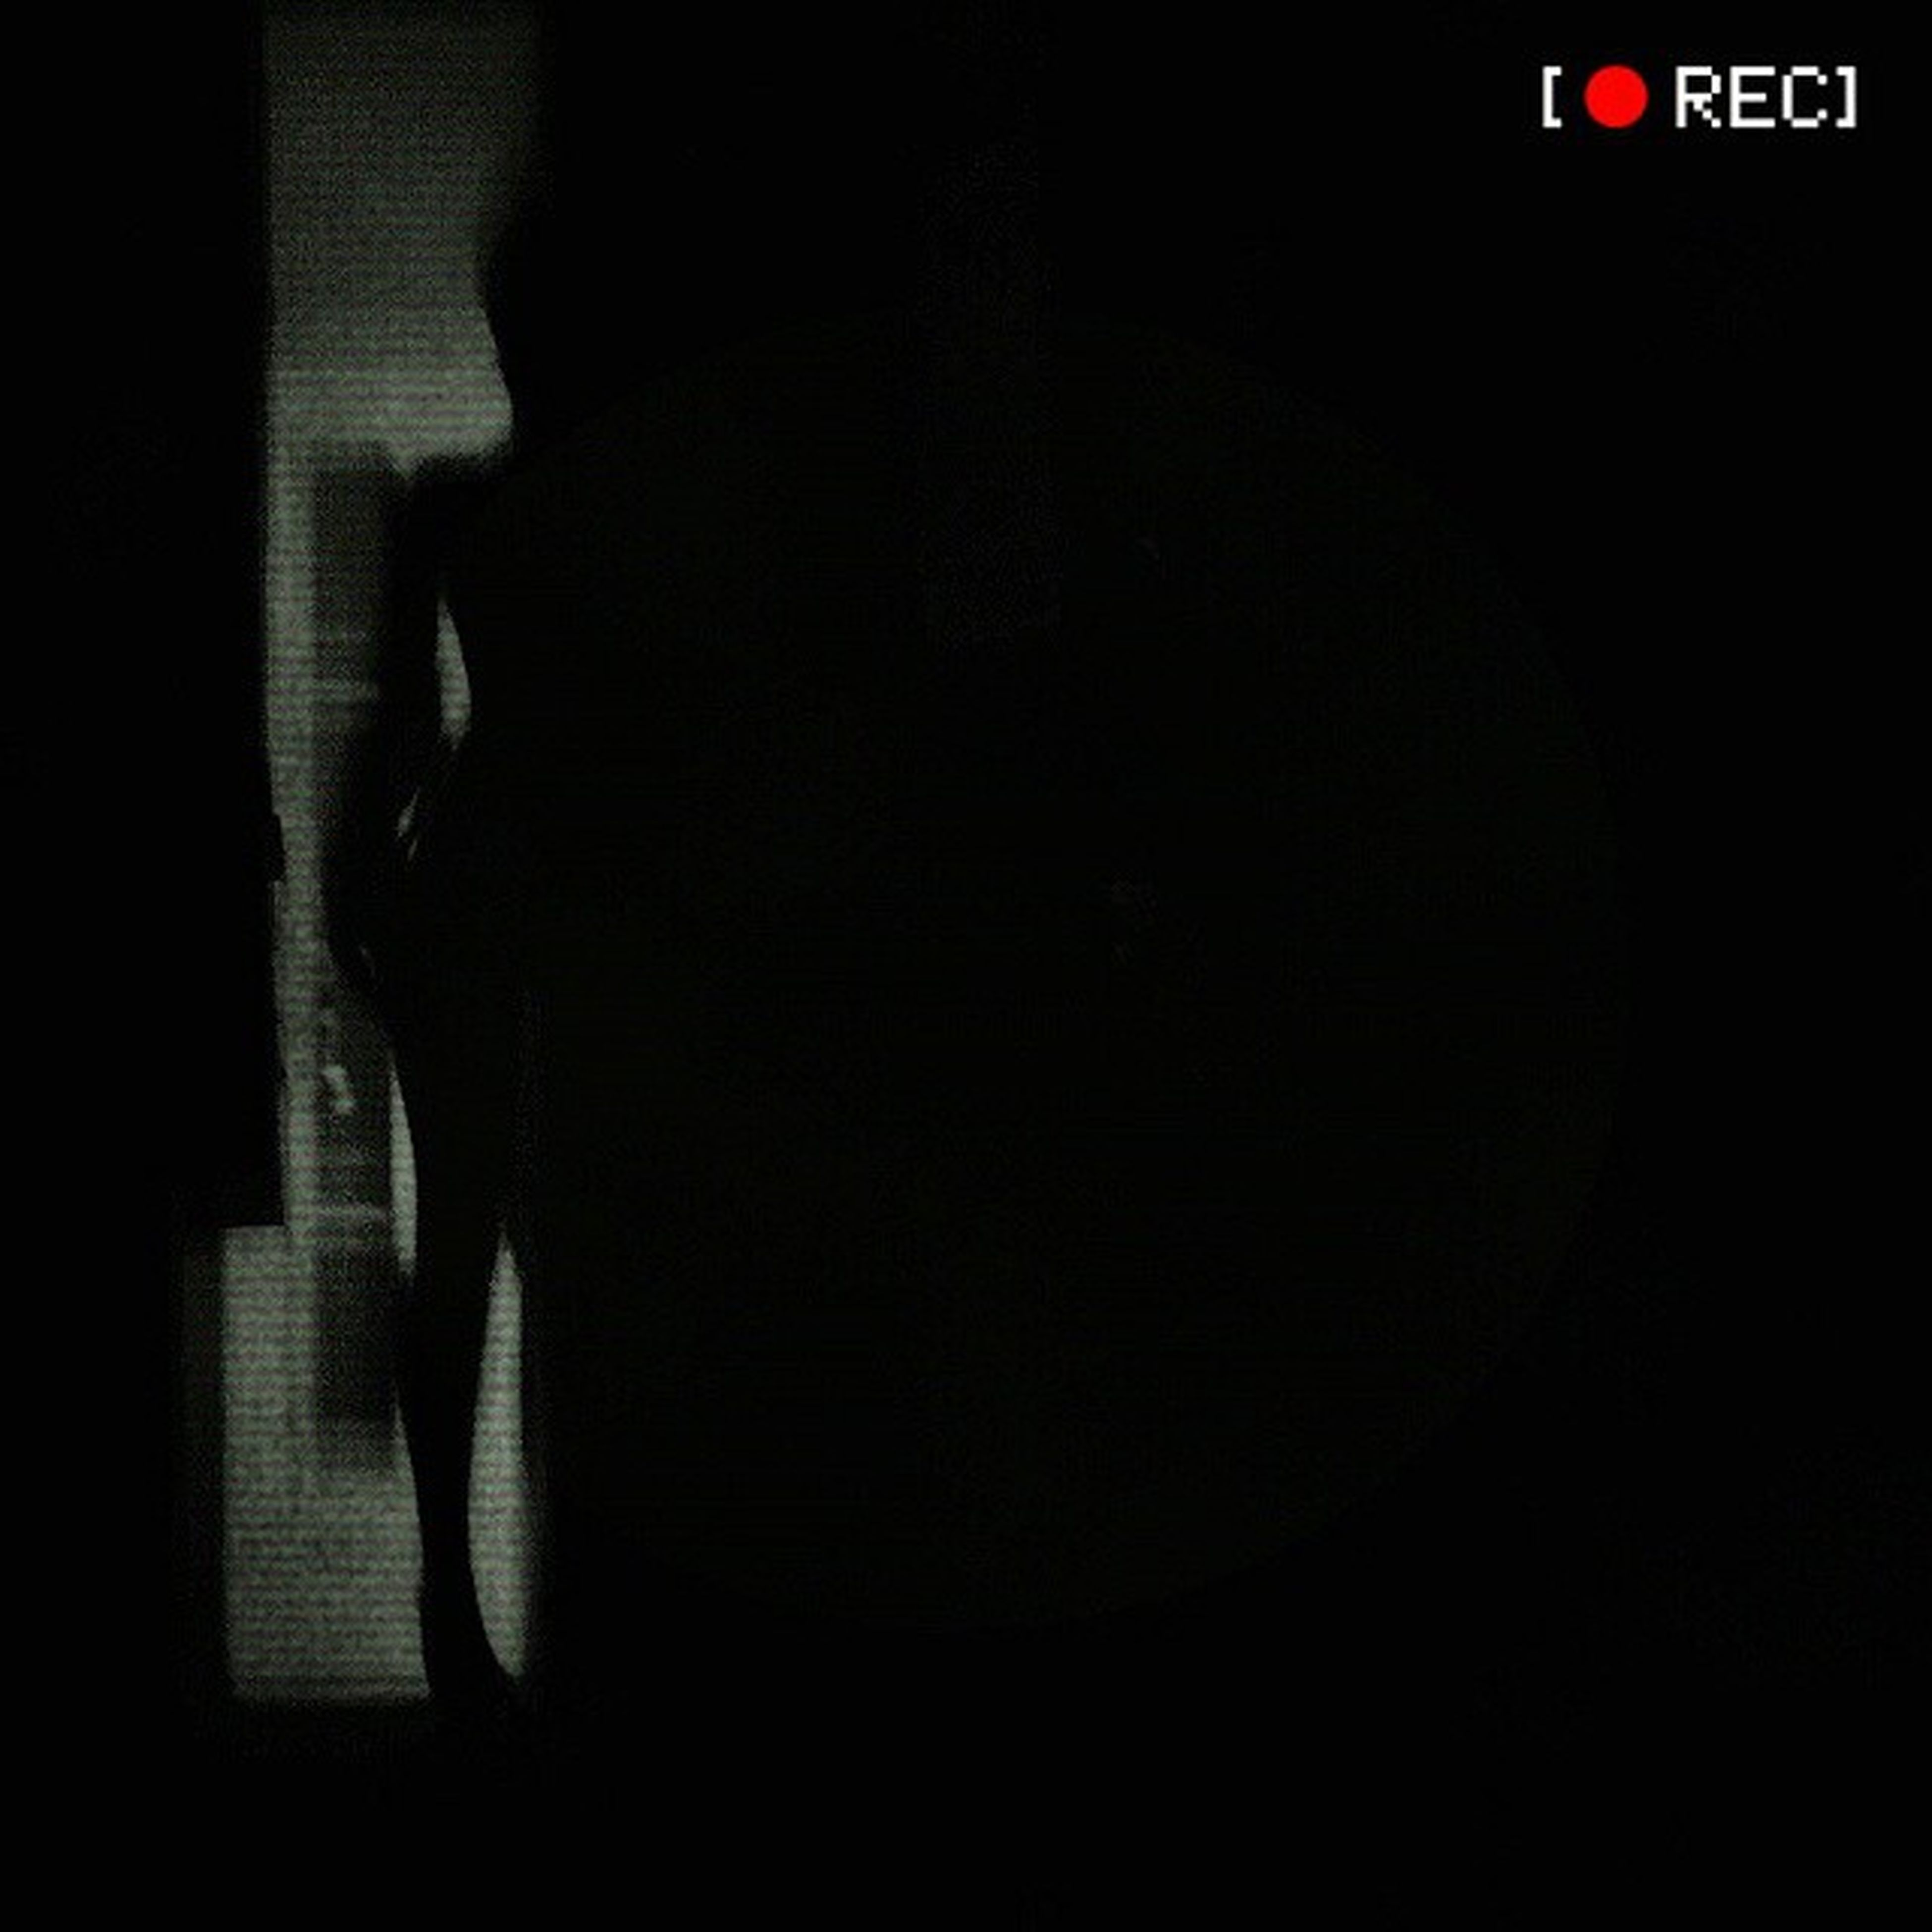 Они среди нас😨 Wigandt_photo Wigandtphoto Wigandt Anapa Анапа арт  Artphoto Art Sonyalpha Minolta Kzoom Russia Россия Horror Страх пришельцы зомбиапокалипсис Scary Zombi Instaart онисрединас ониужесрединас Triller триллер ужас